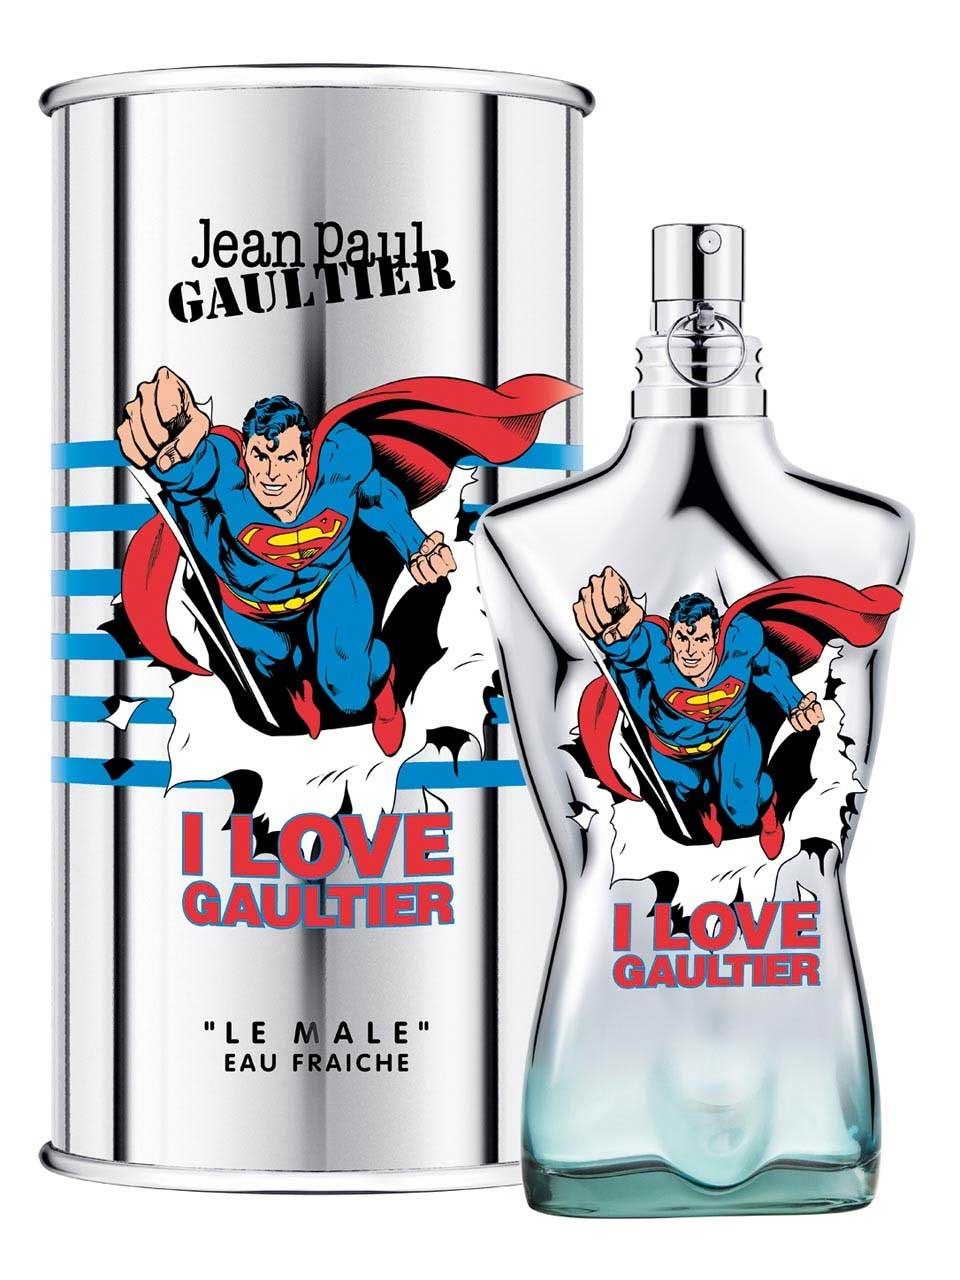 Le Male Superman Eau Fraiche Jean Paul Gaultier Colonia - una nuevo ...